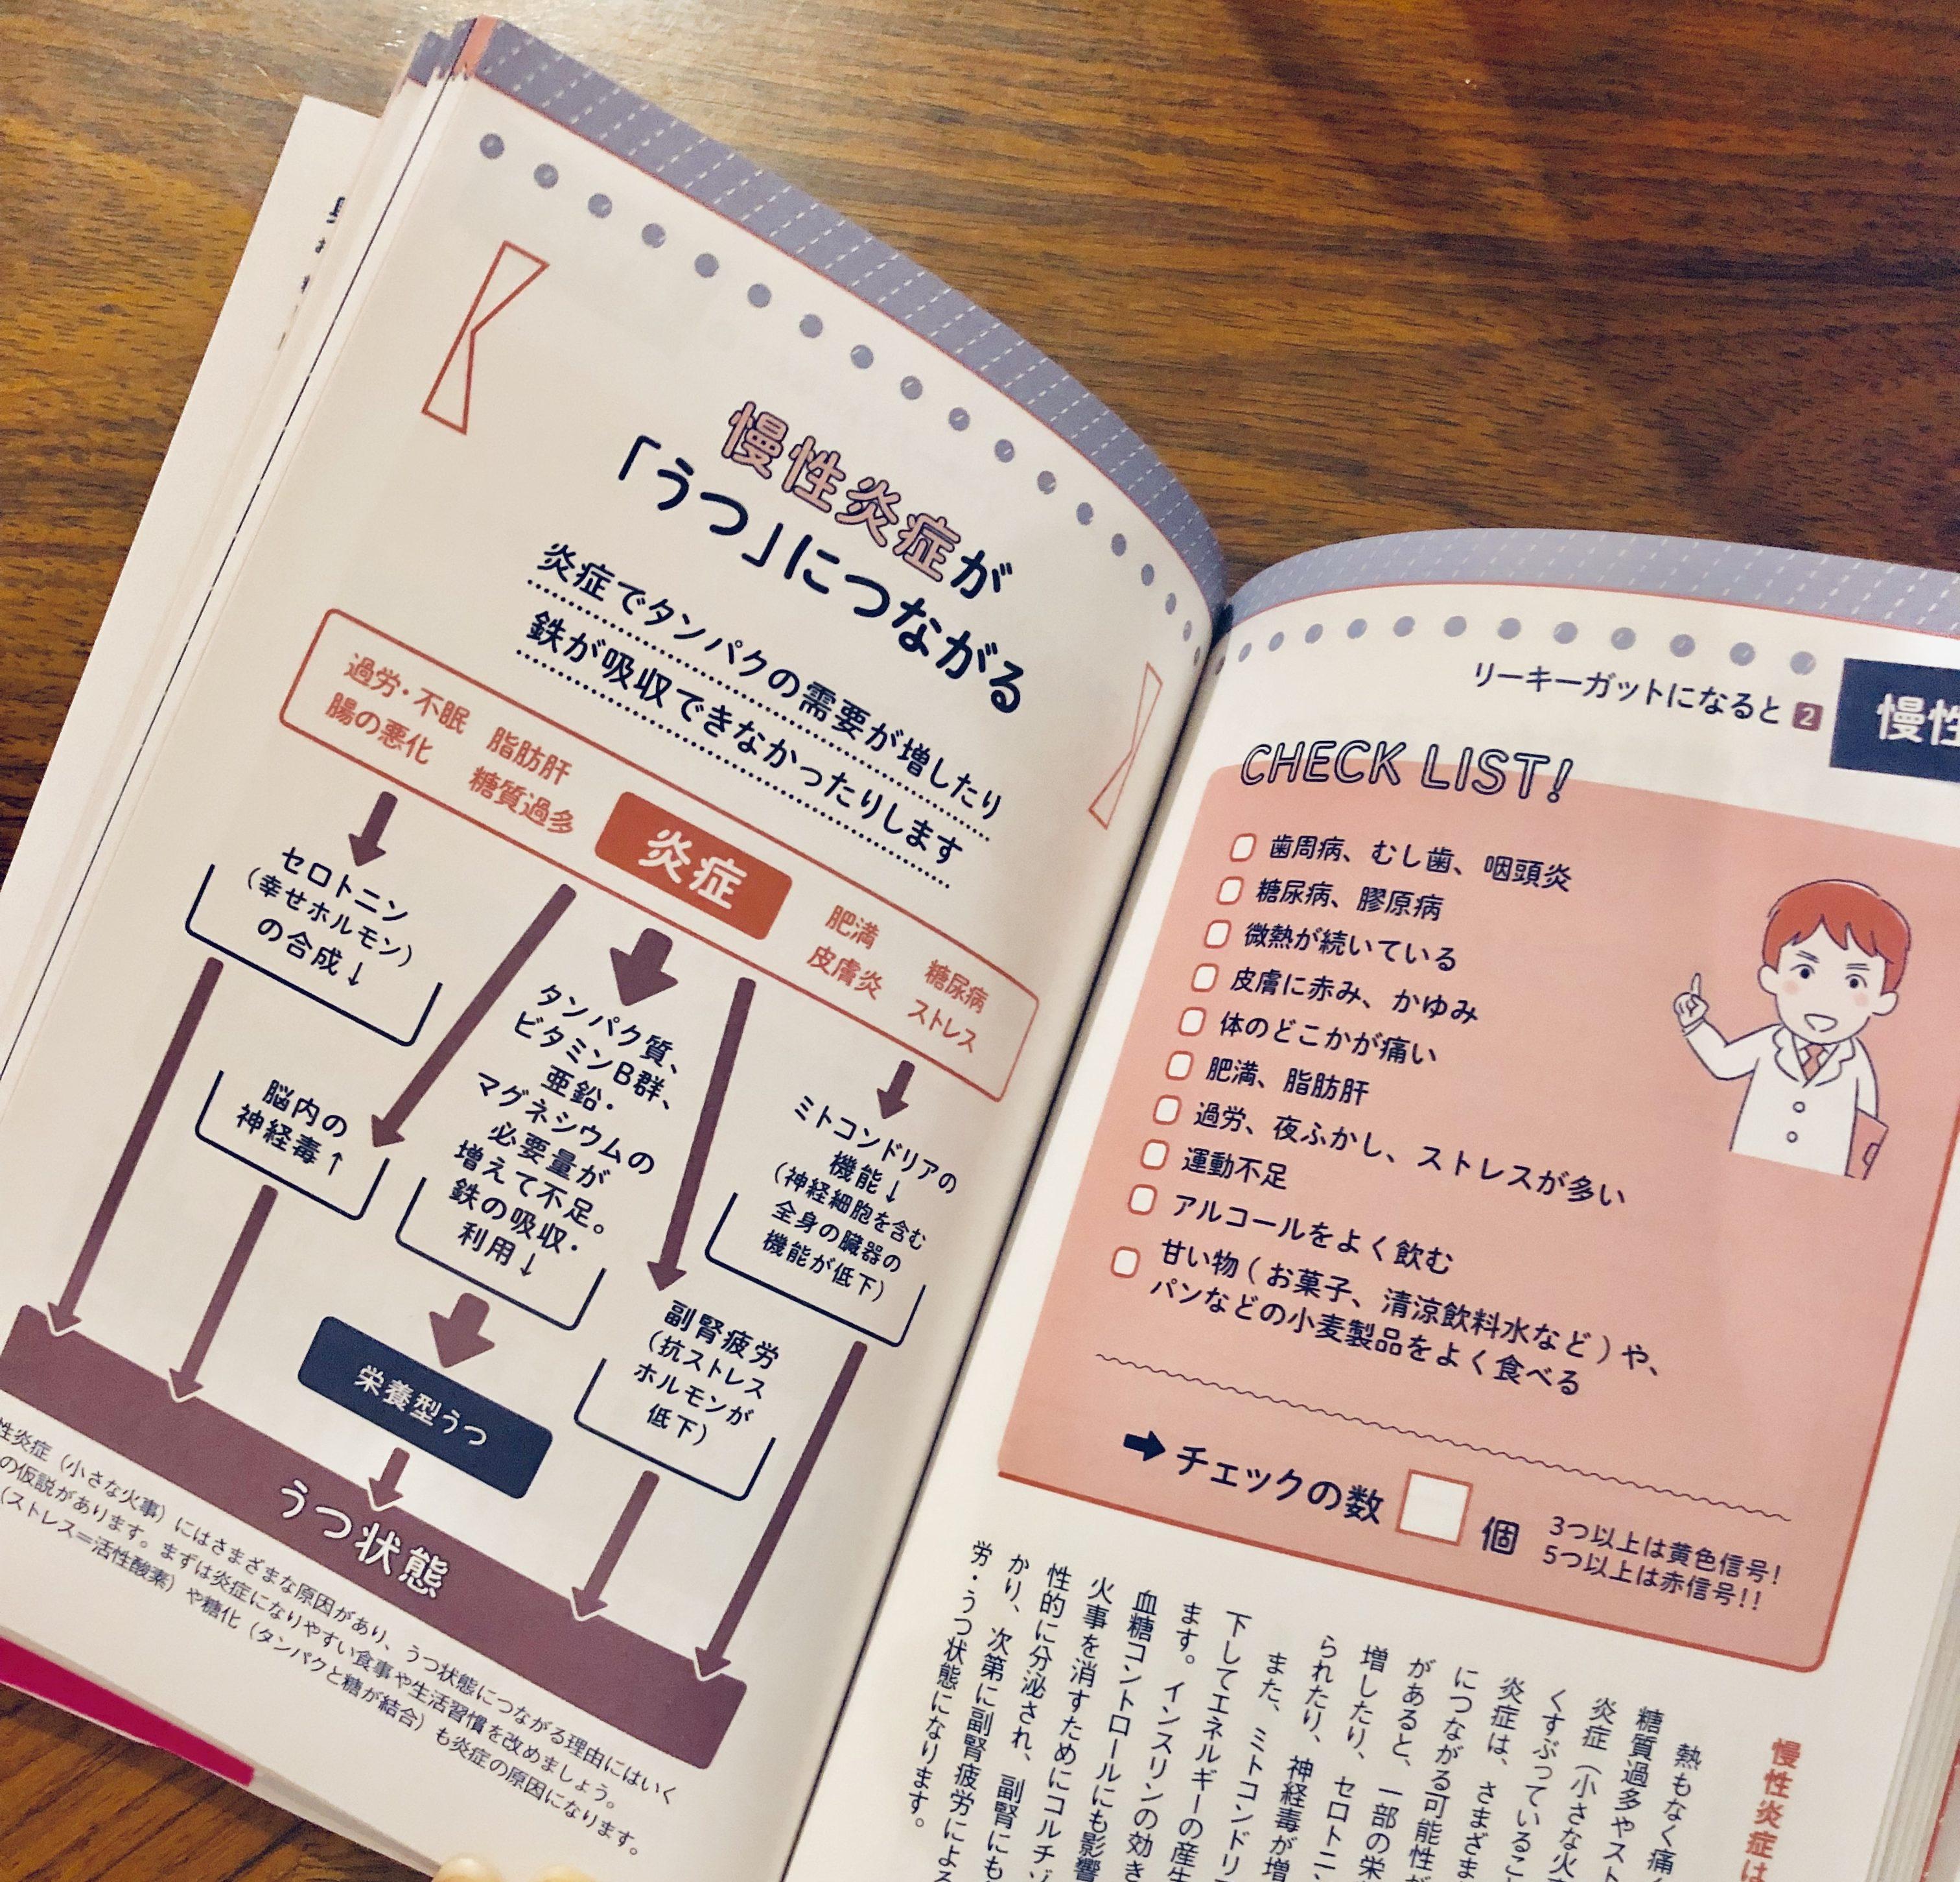 book utunuke syokujizyutu honbun